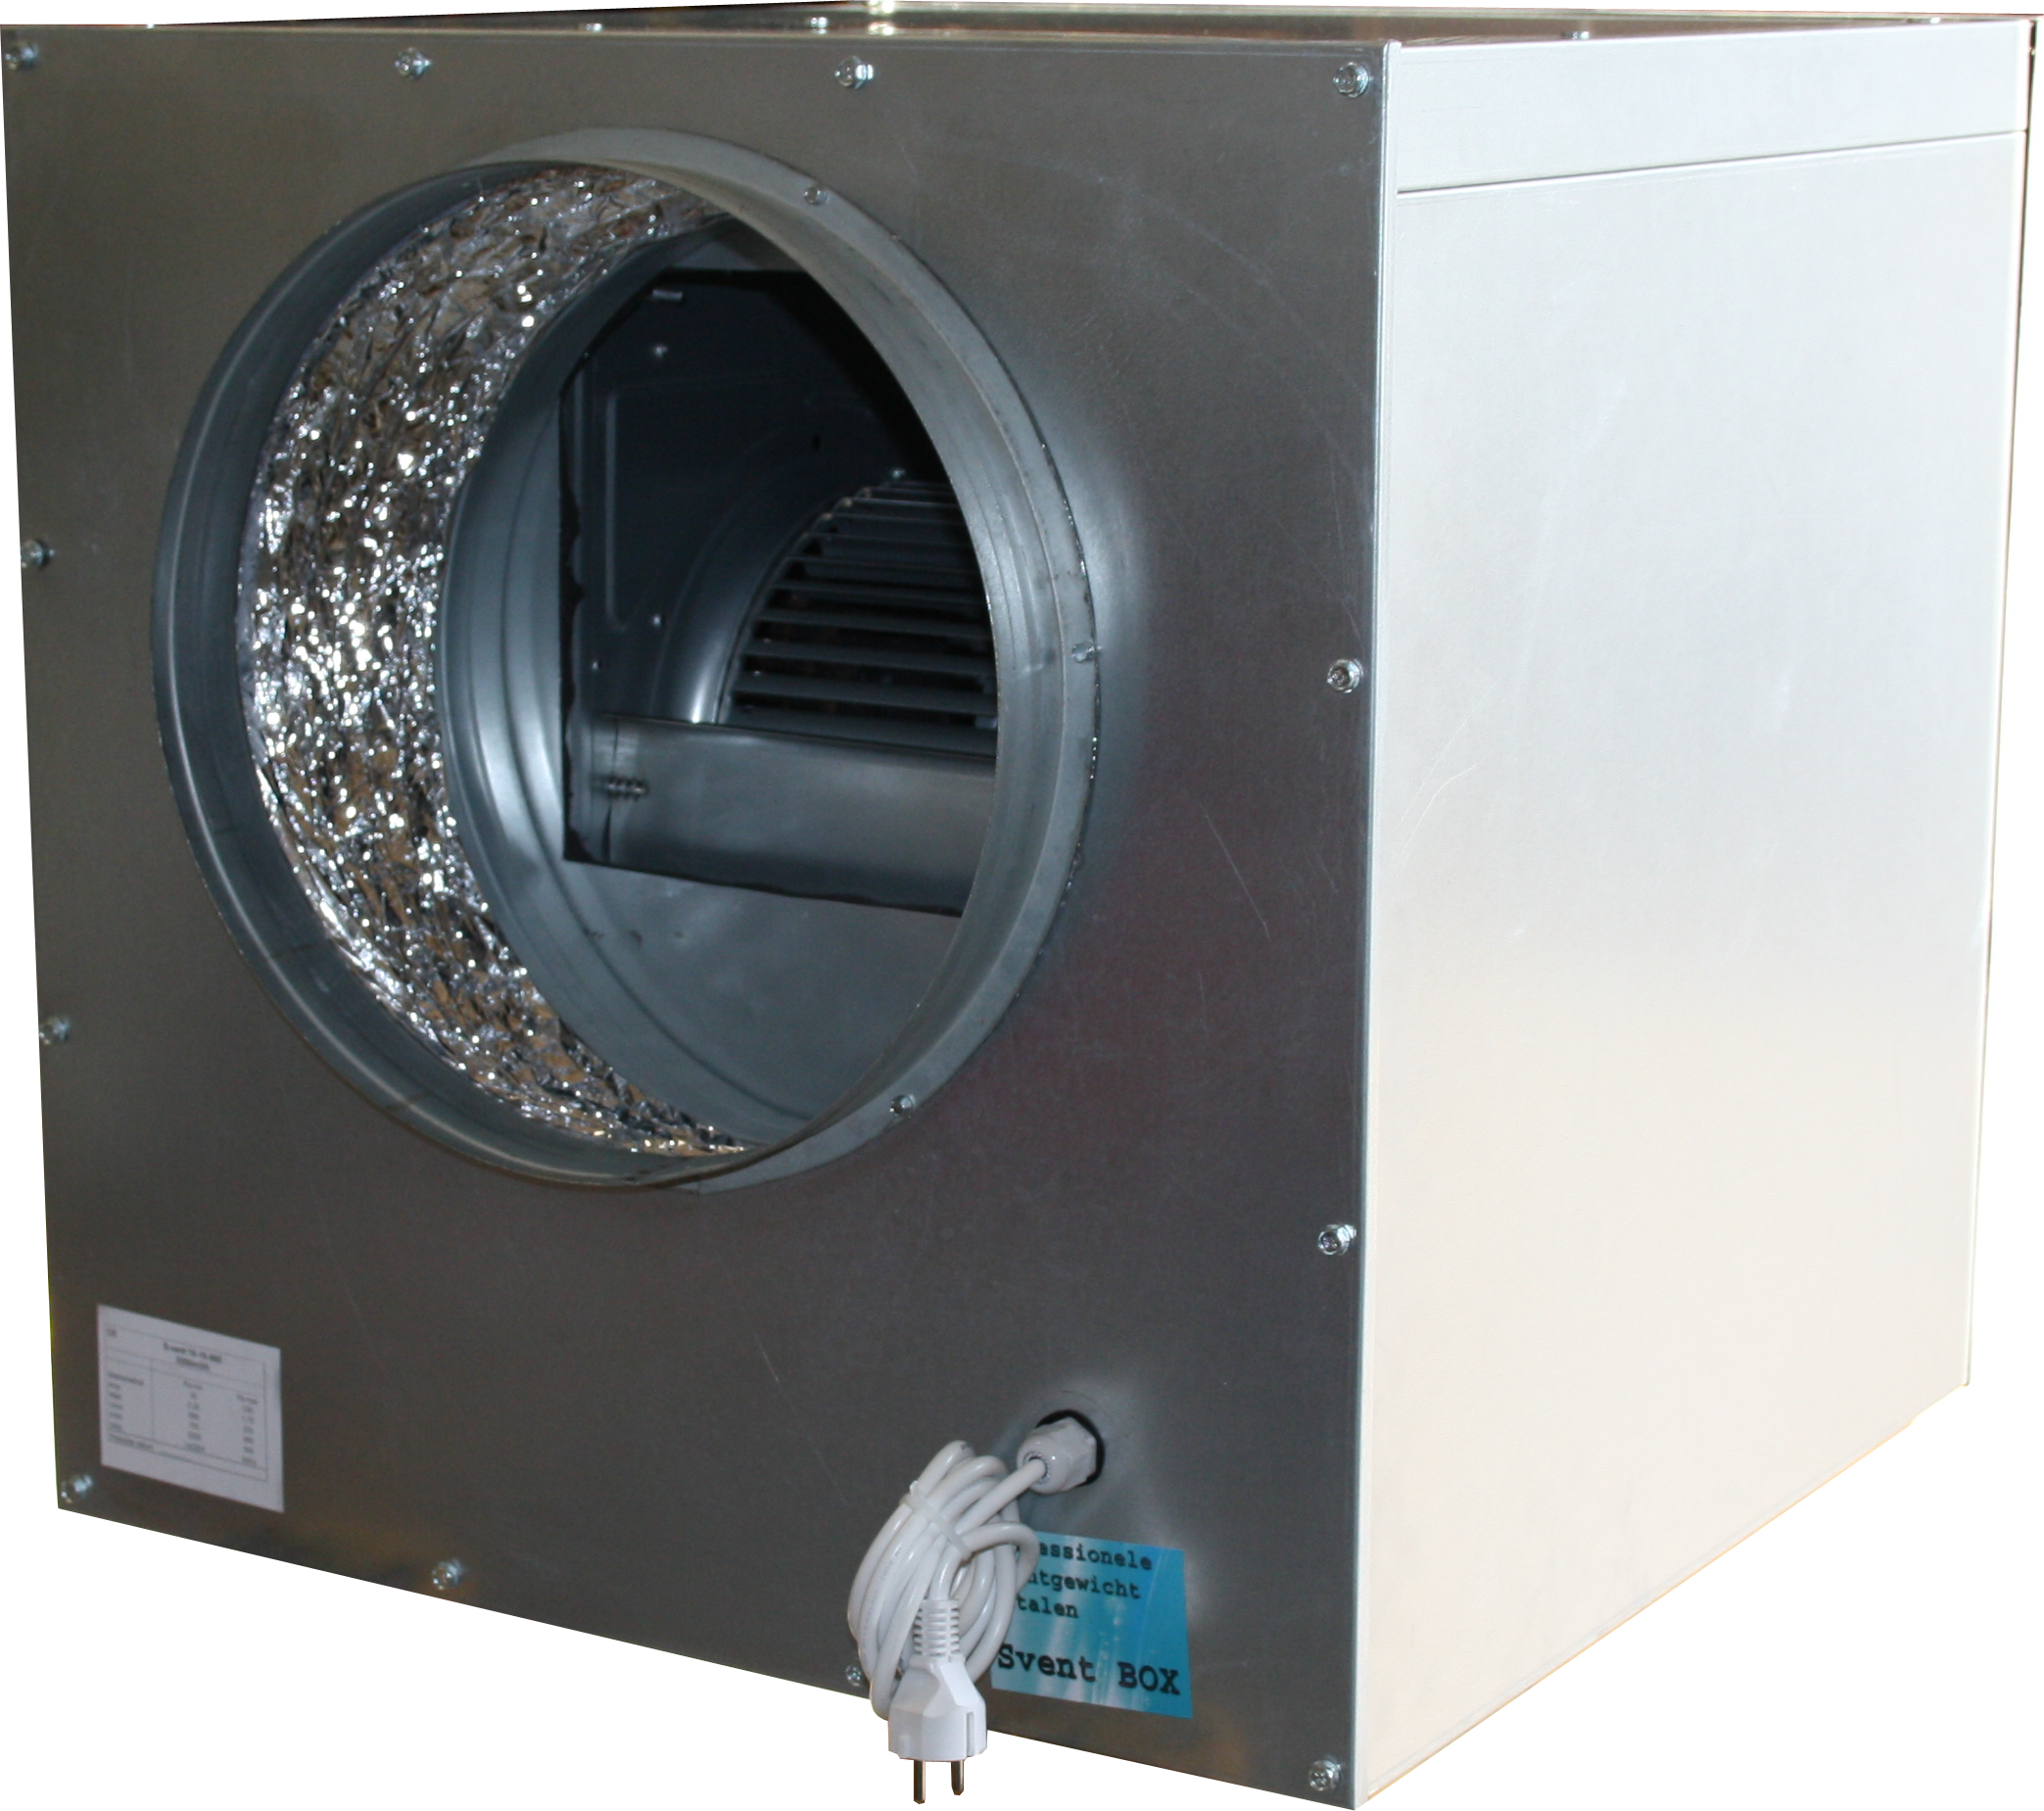 Spirototaal.nl Soft box ventilator 6000m3